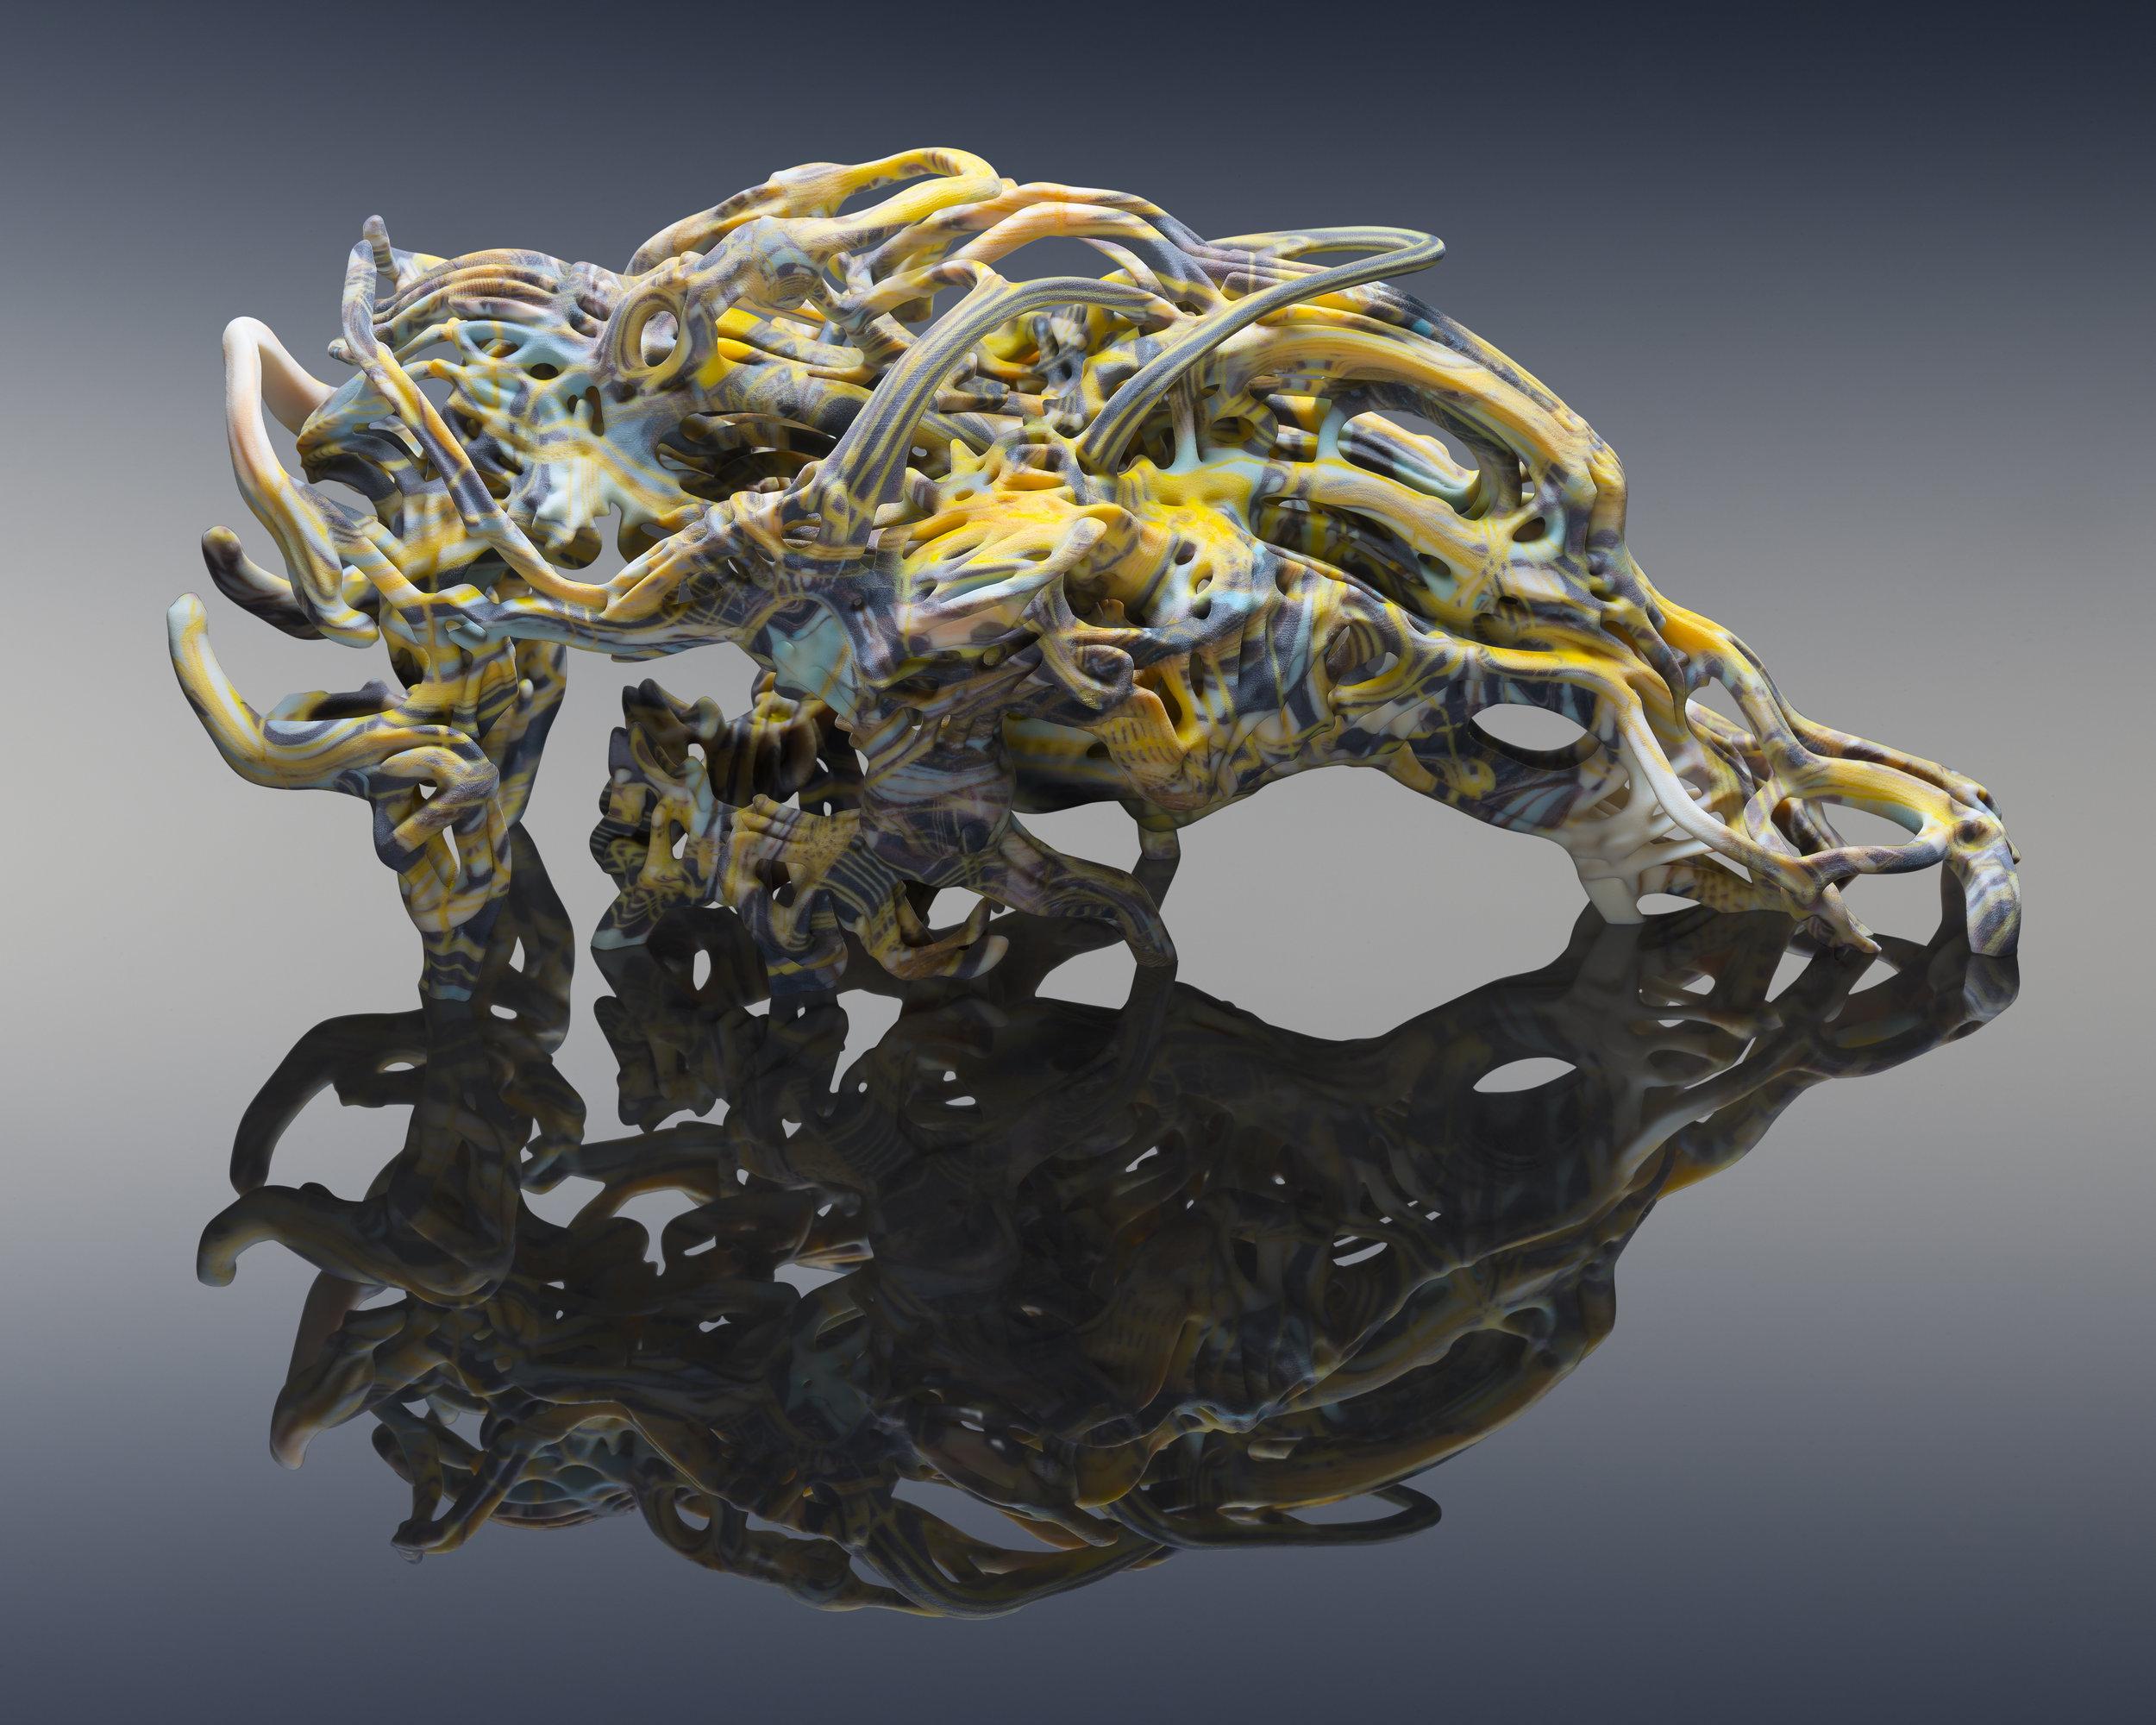 Wolfkiam - Stratasysss j750 3D Printer